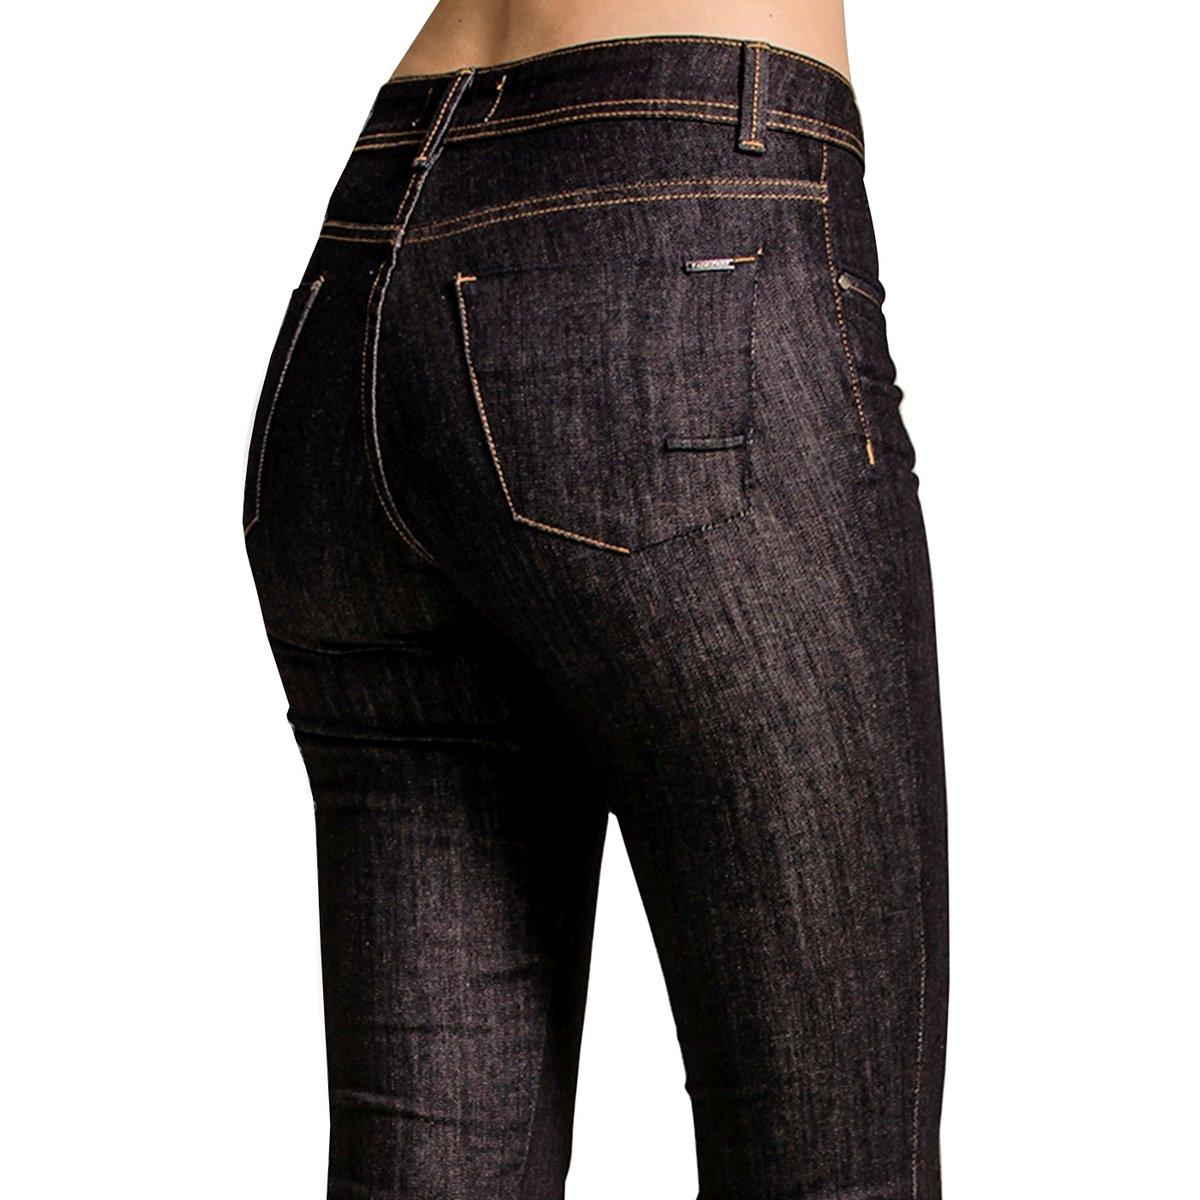 Calça Jeans Reta Calvin Klein Feminina - Azul - Compre Agora   Zattini b3801f9ad0